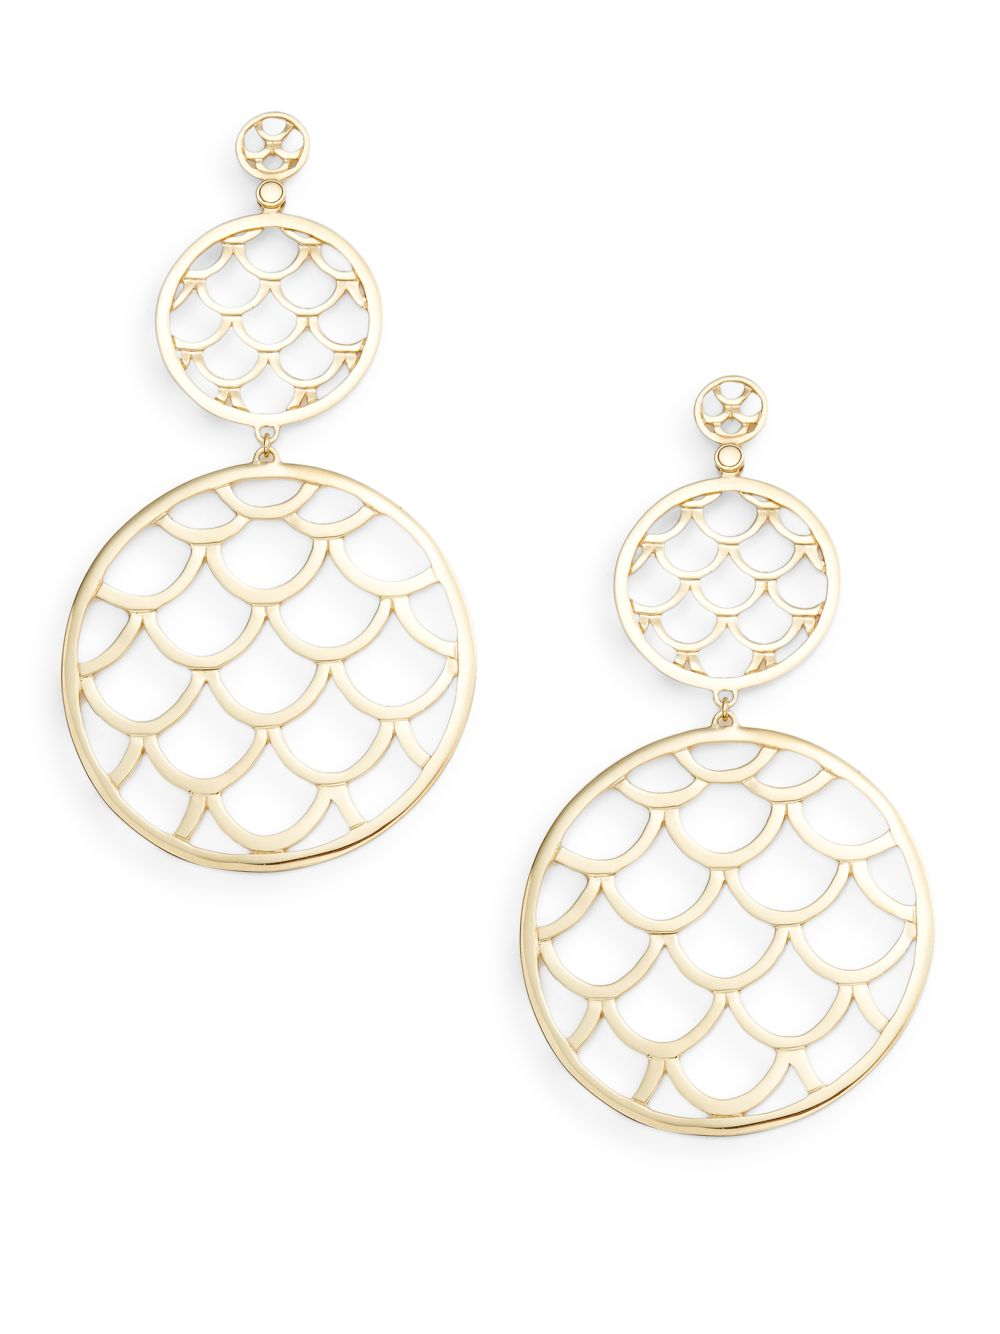 John hardy naga 18k yellow gold double round drop earrings for John hardy jewelry earrings